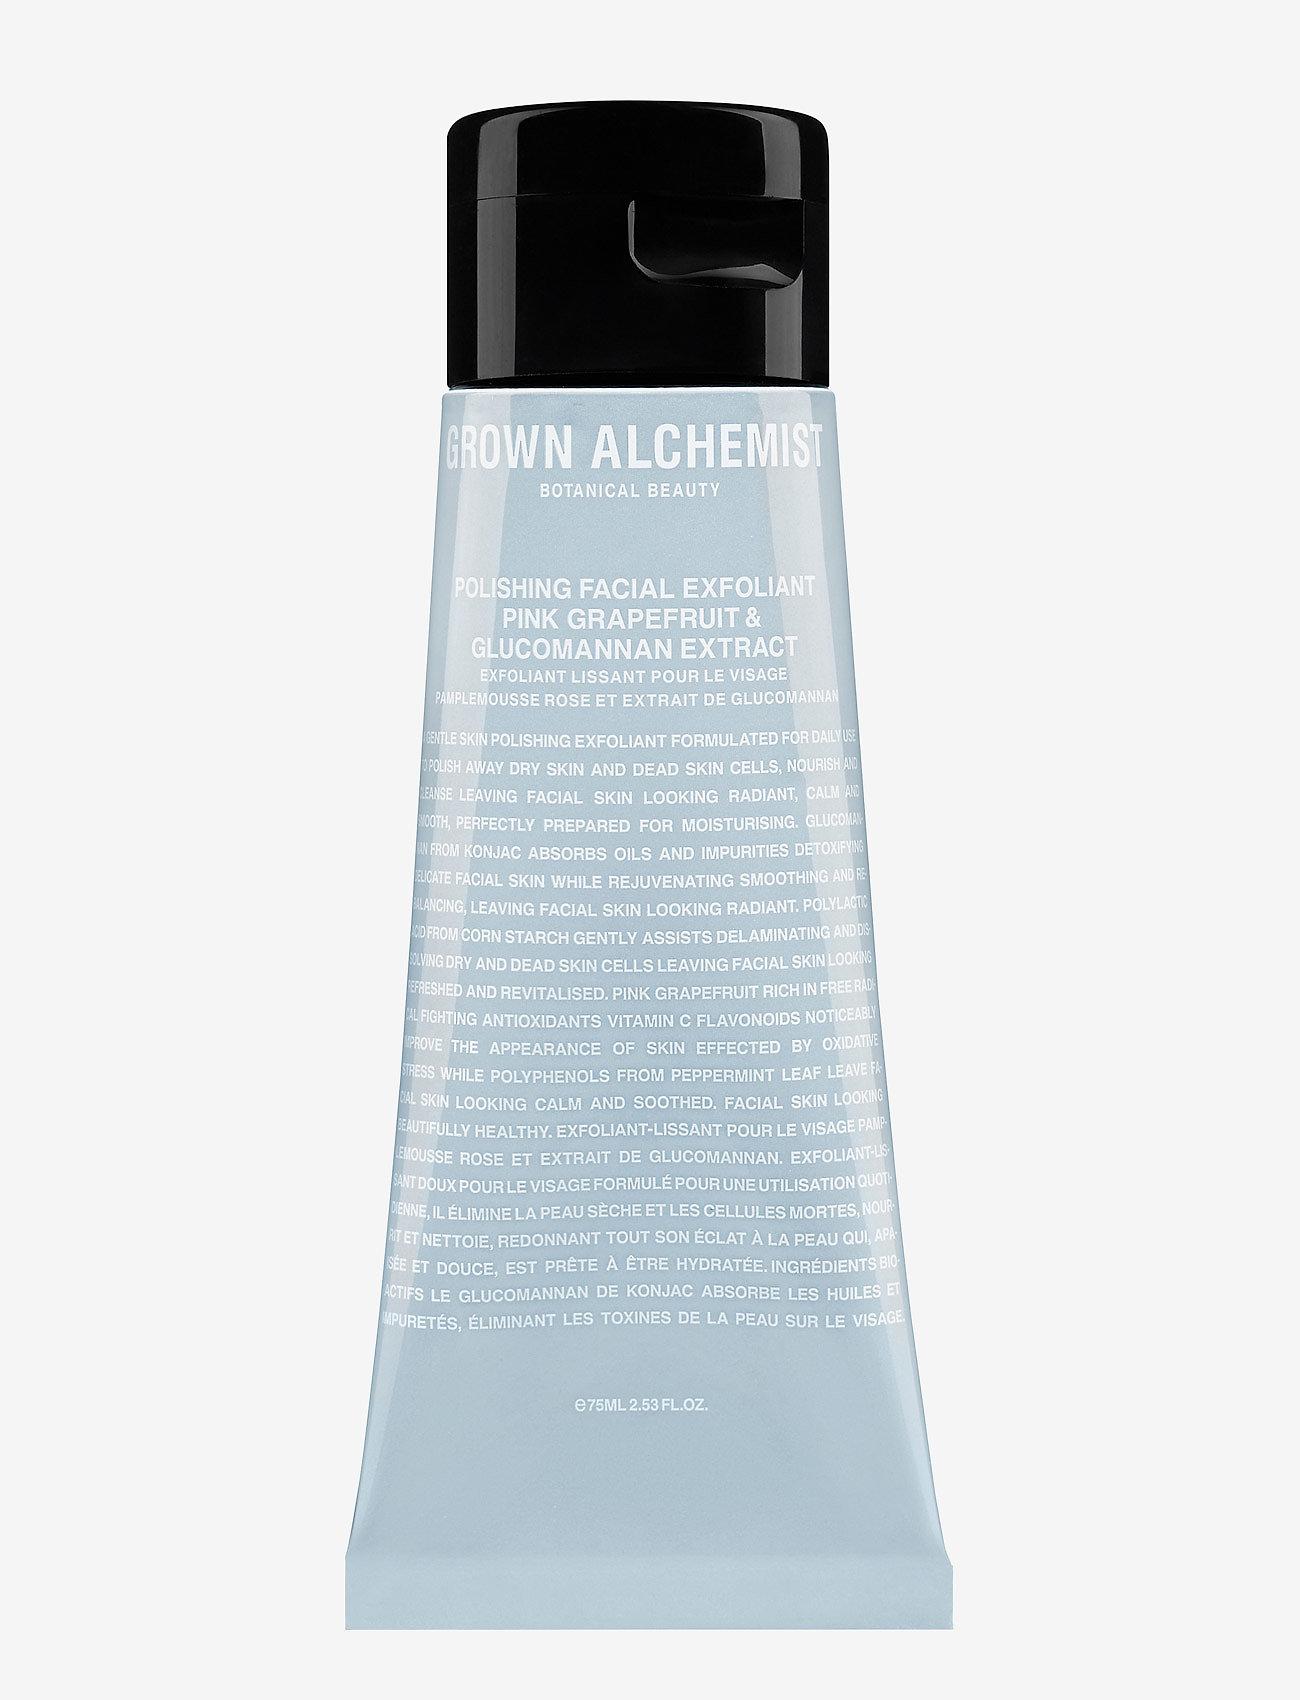 Grown Alchemist - Polishing Facial Exfoliant: Pink Grapefruit & Glucomannan Ex - peeling - clear - 0